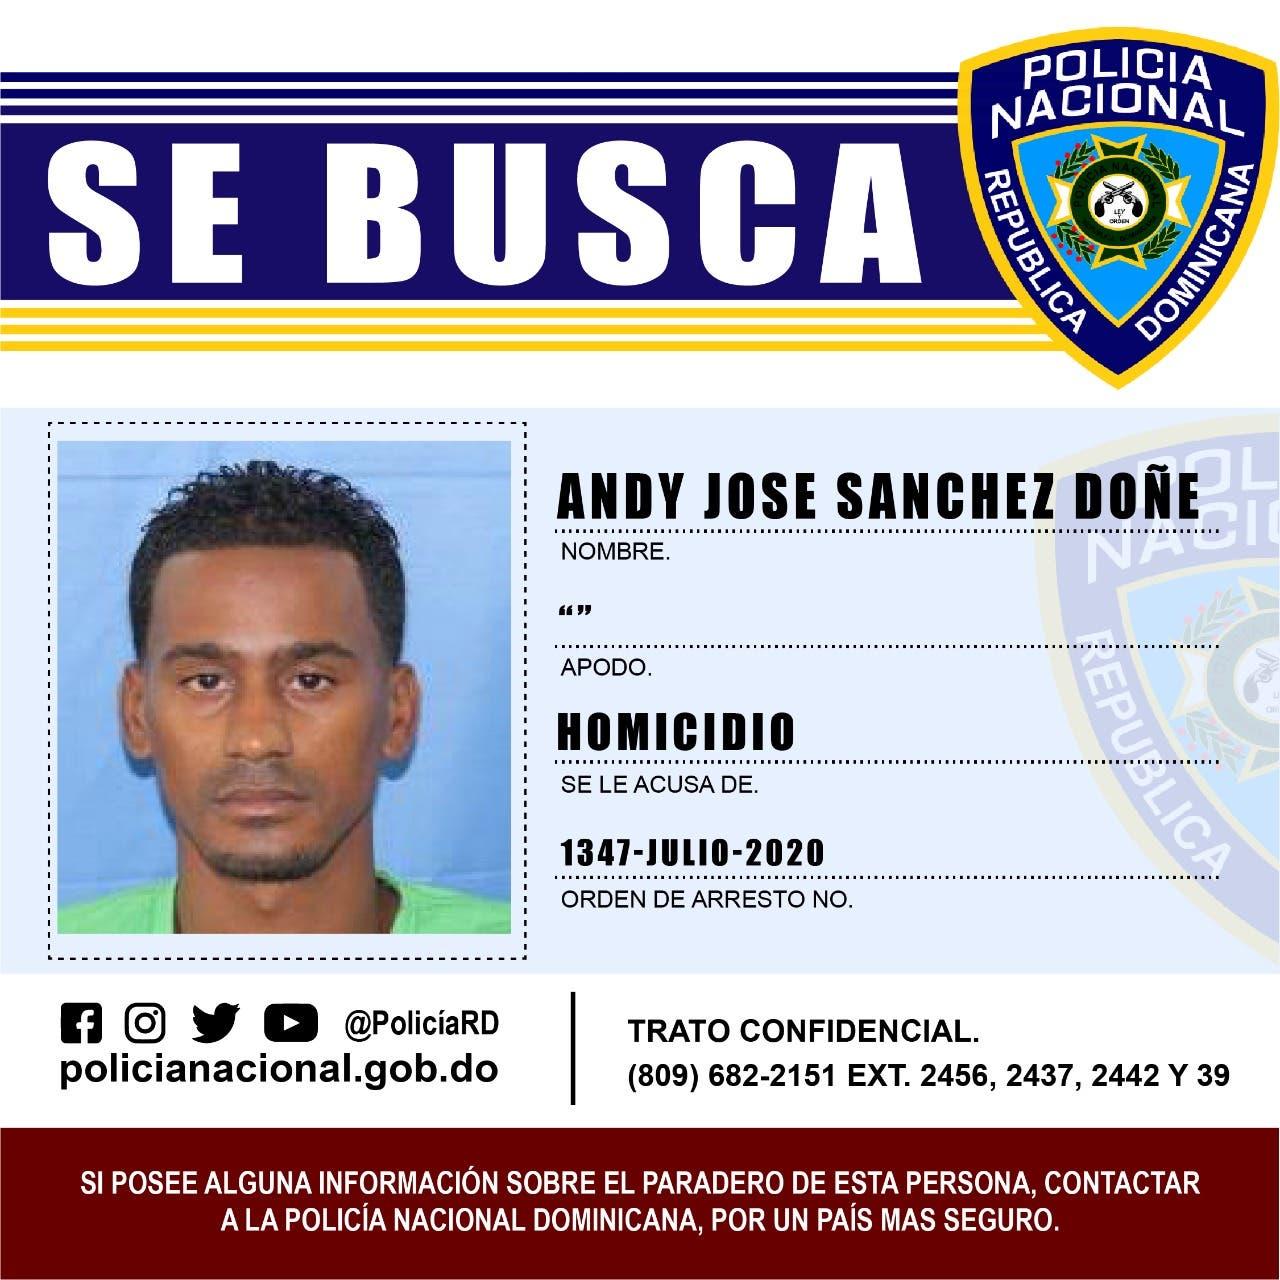 Apresan en Capotillo a Andy Sánchez Doñé, presunto autor material muerte dirigente PRM